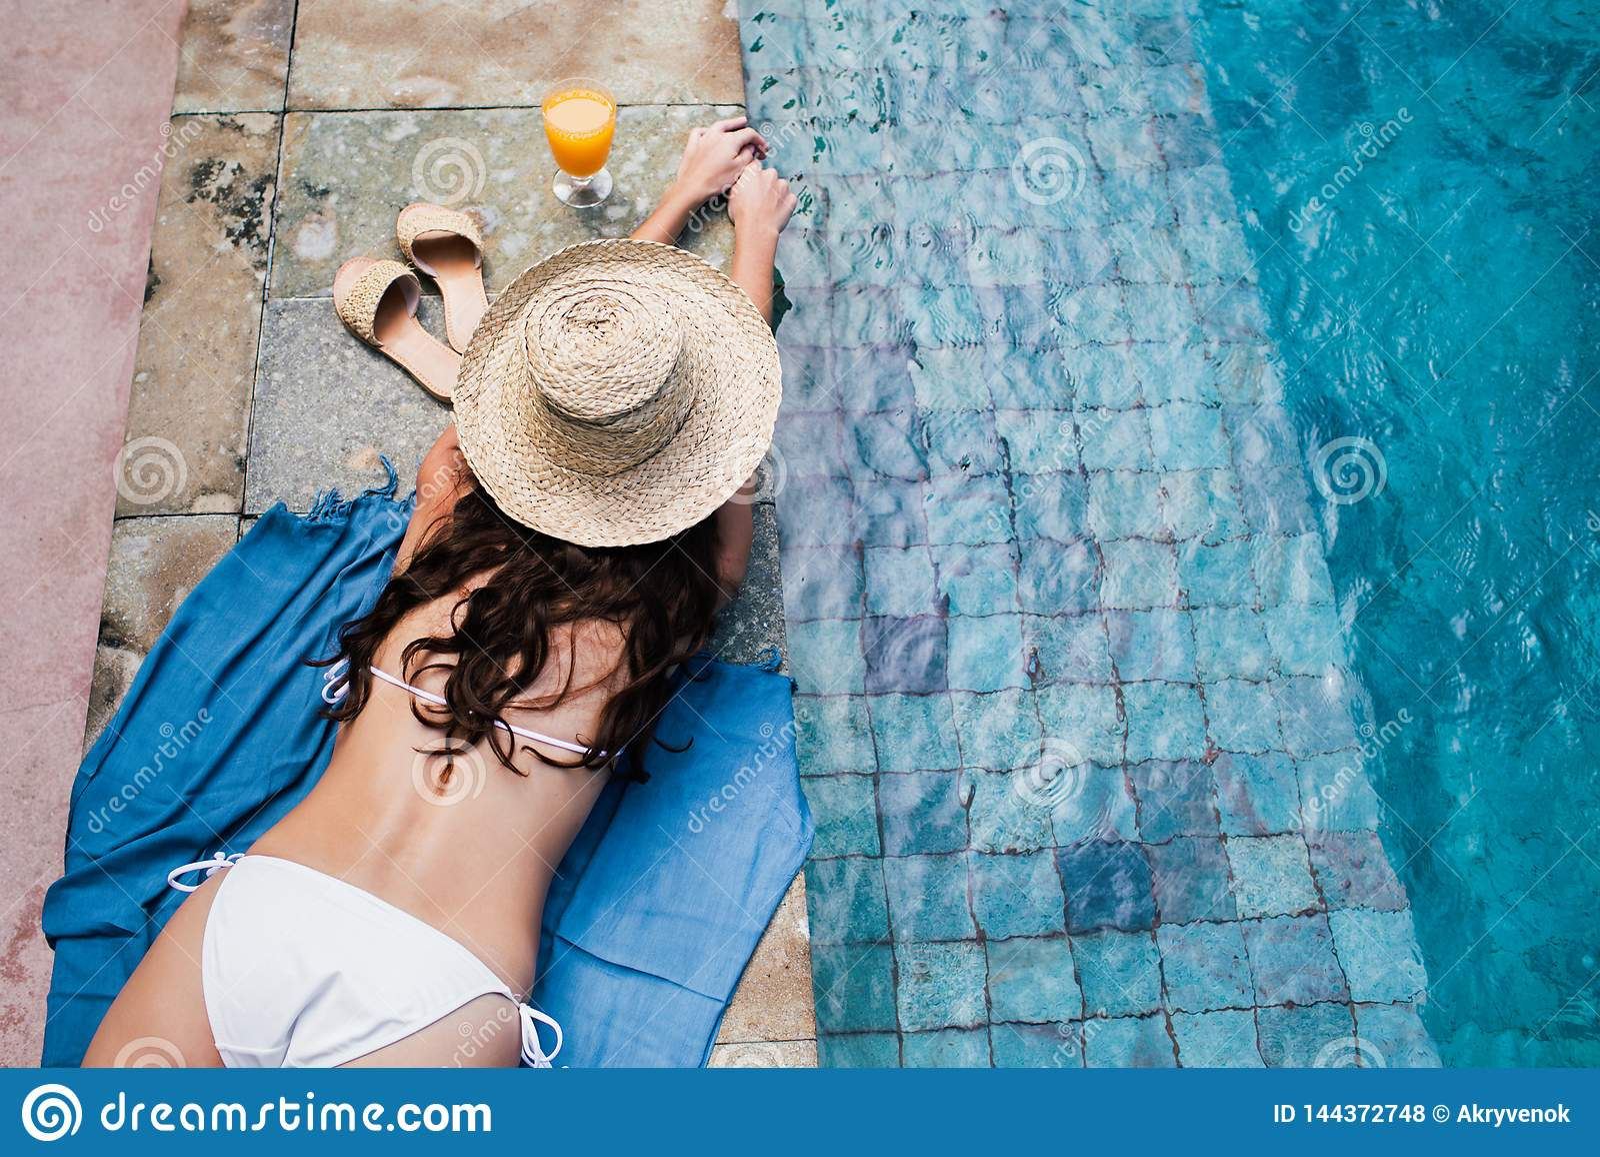 Woman relaxing in swimming pool.